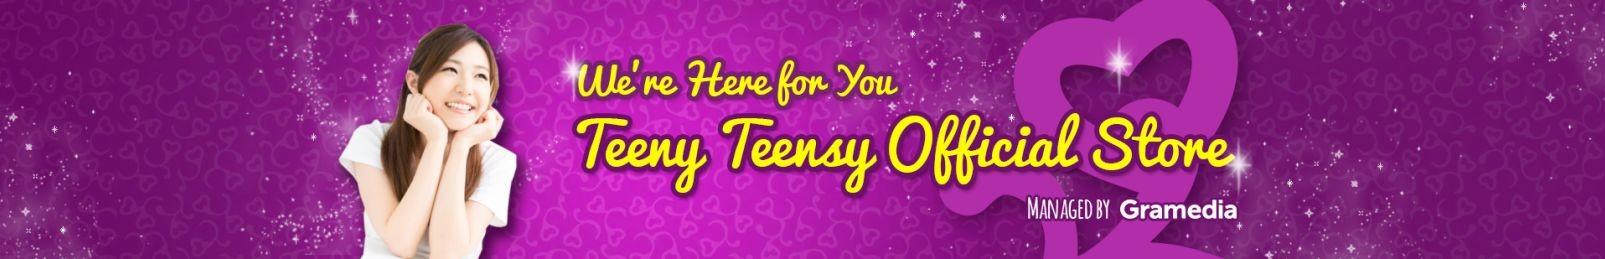 Teeny Teensy